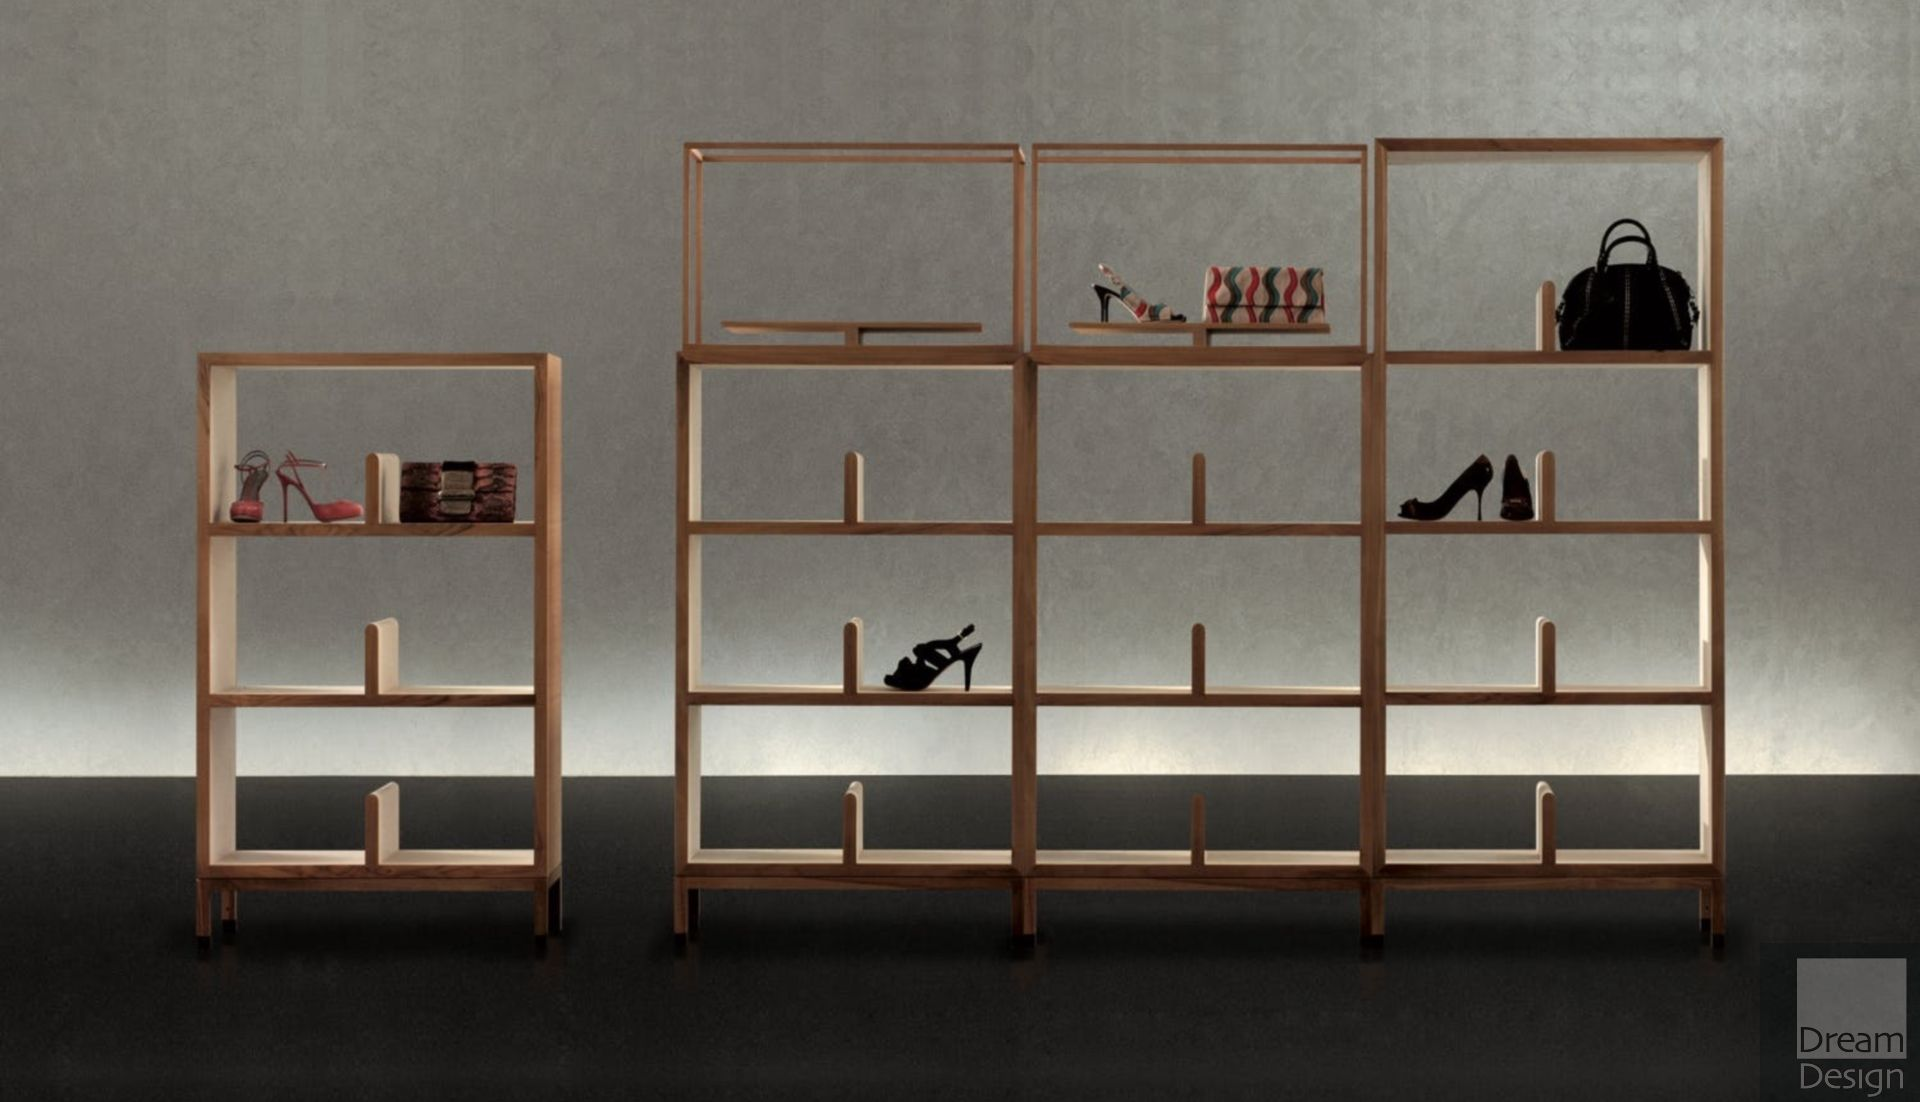 Nea Book Shelving in 2020 Shelves, Storage